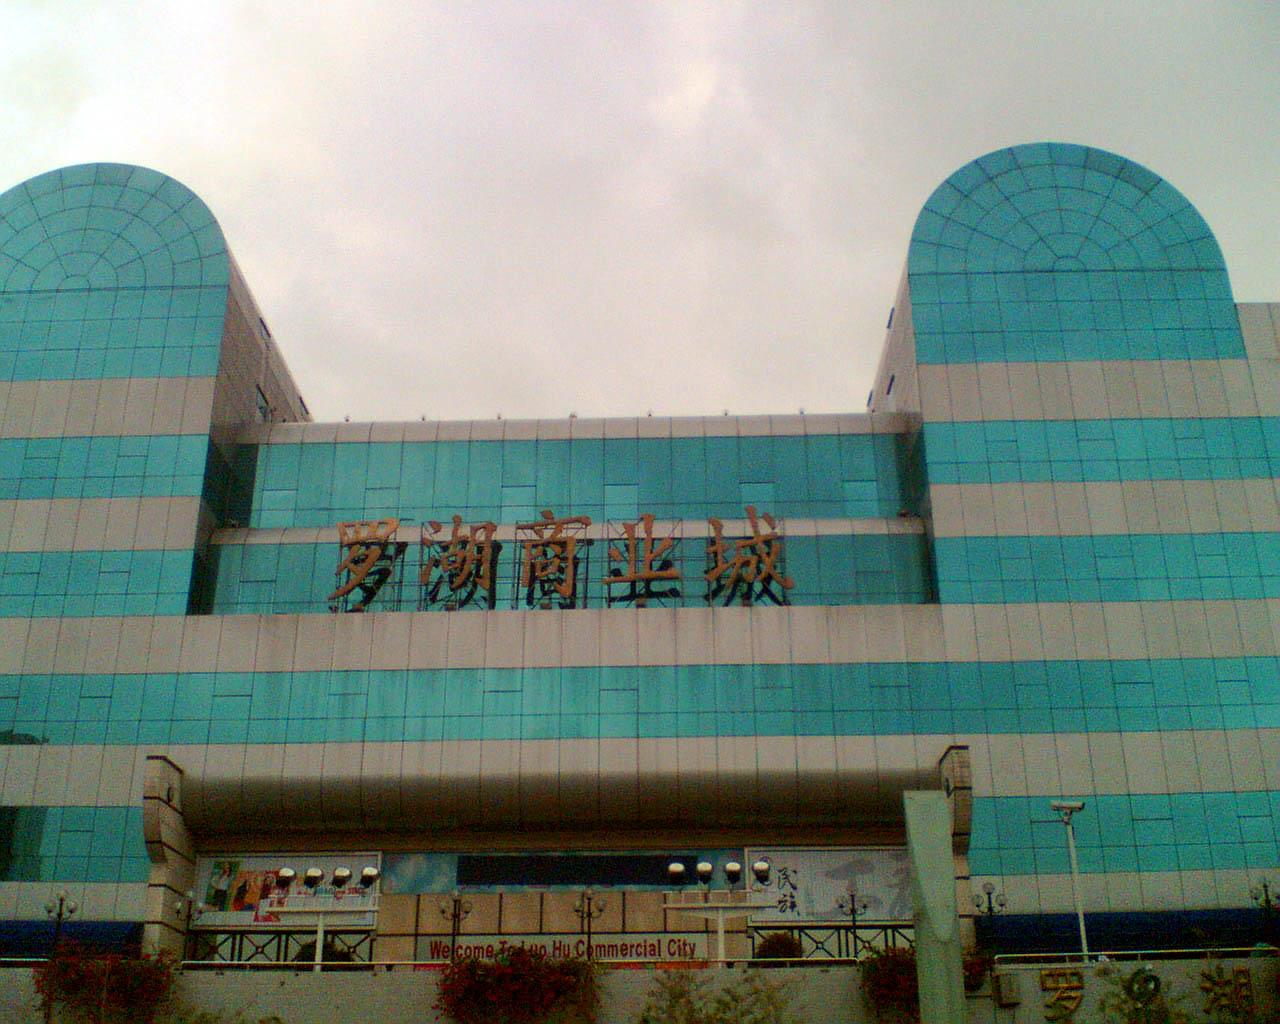 羅湖商業城 - 深圳綜合資訊指南集團( 二零零七)新天地 Shenzhen Composite Informationgroup(2007) NEW Wonderful Worlds